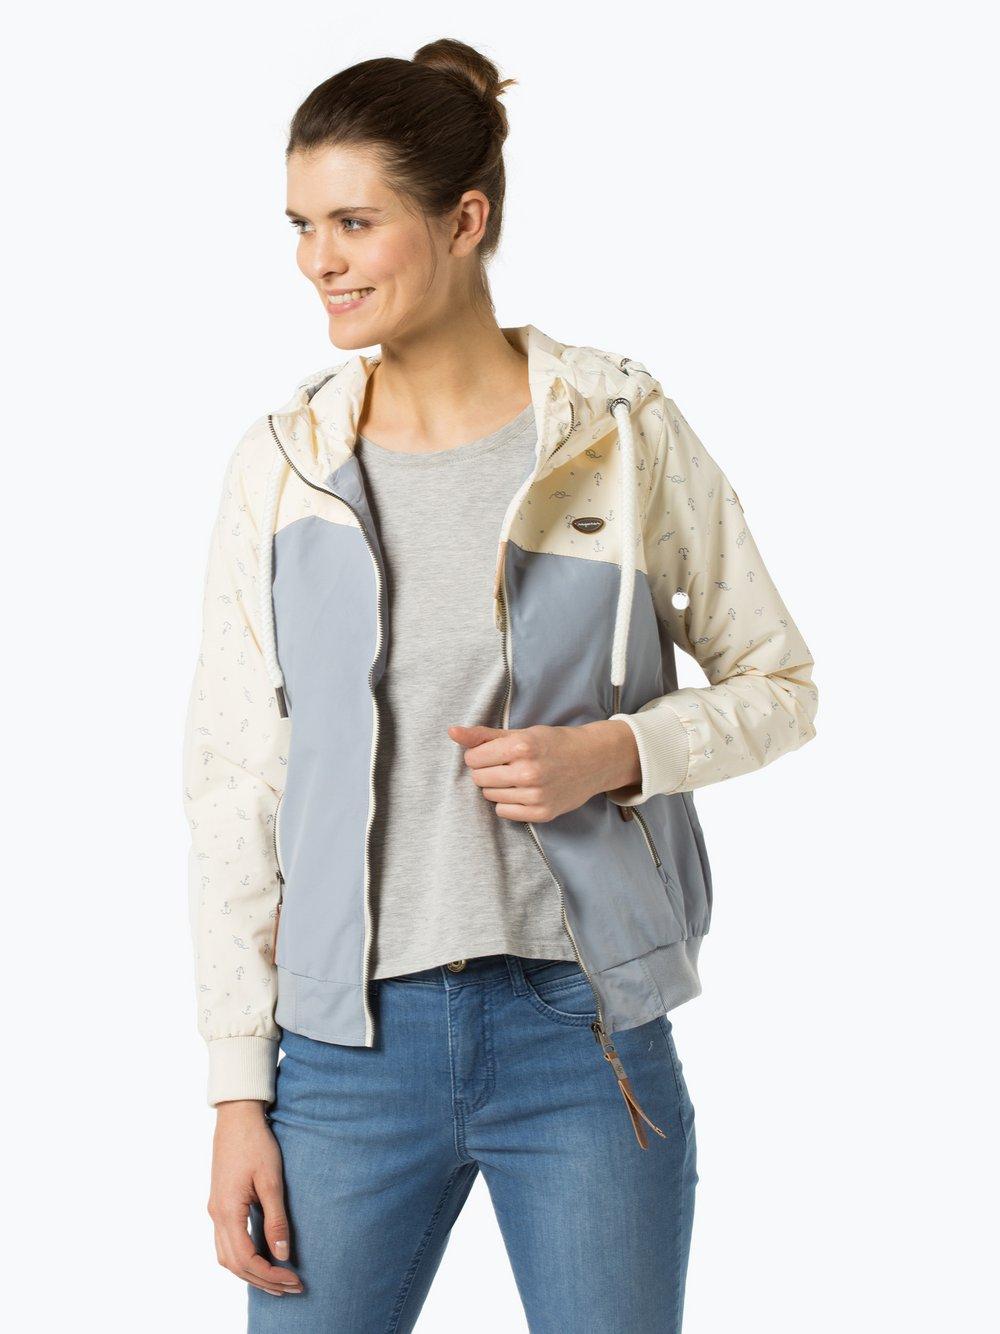 b44c1565c6b77f Ragwear Damen Jacke - Nuggie B online kaufen   VANGRAAF.COM